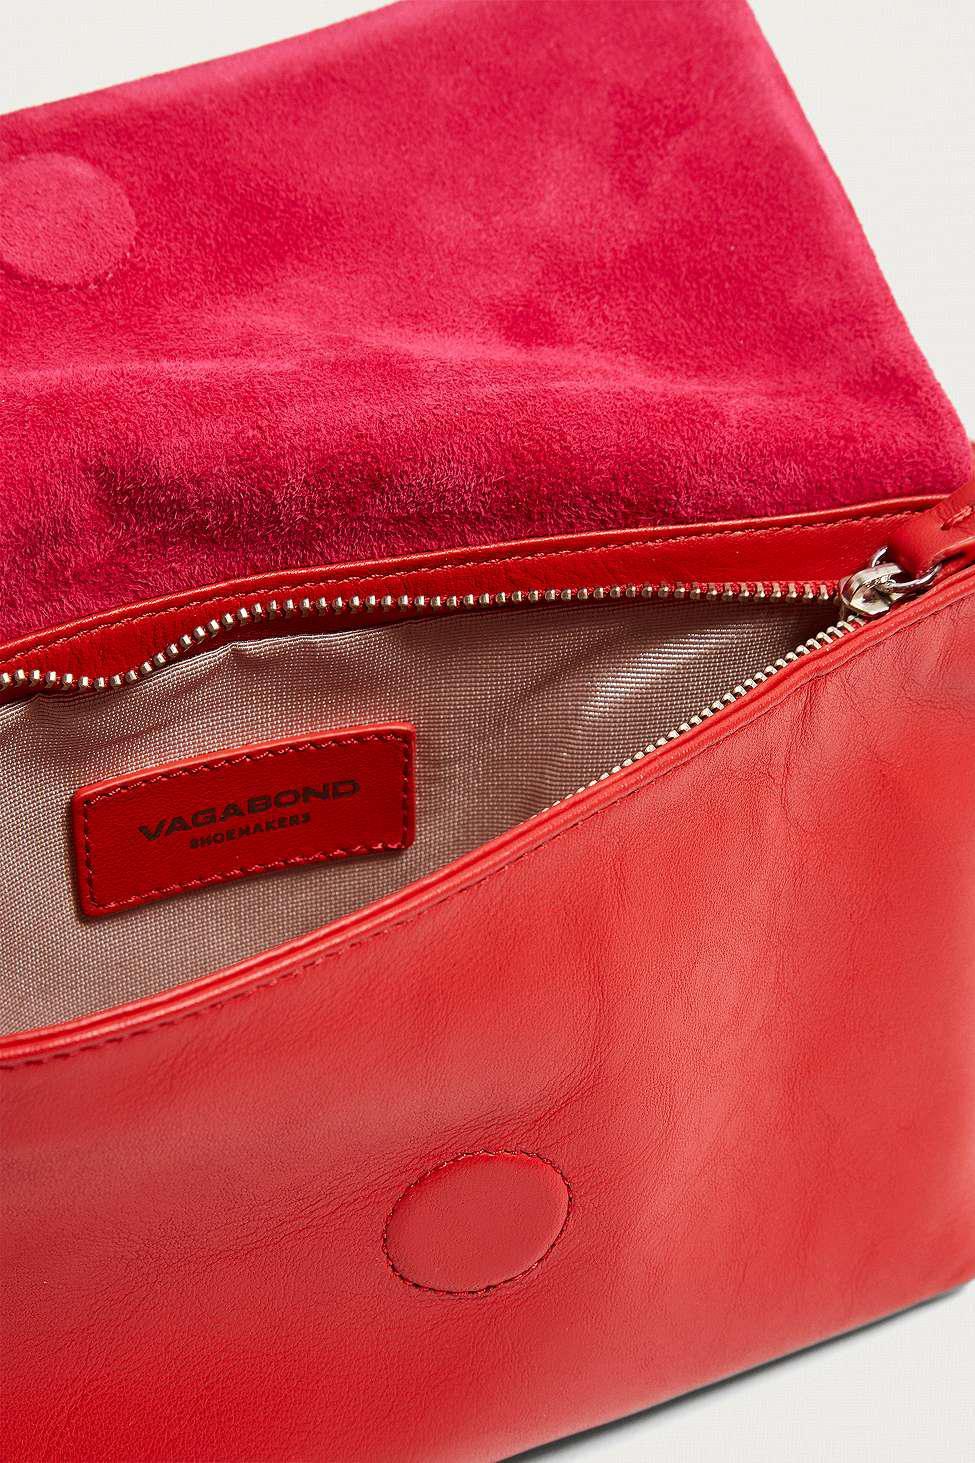 591fbbc35ff3b Vagabond Copenhagen Red Leather Bum Bag - Womens All in Red - Lyst